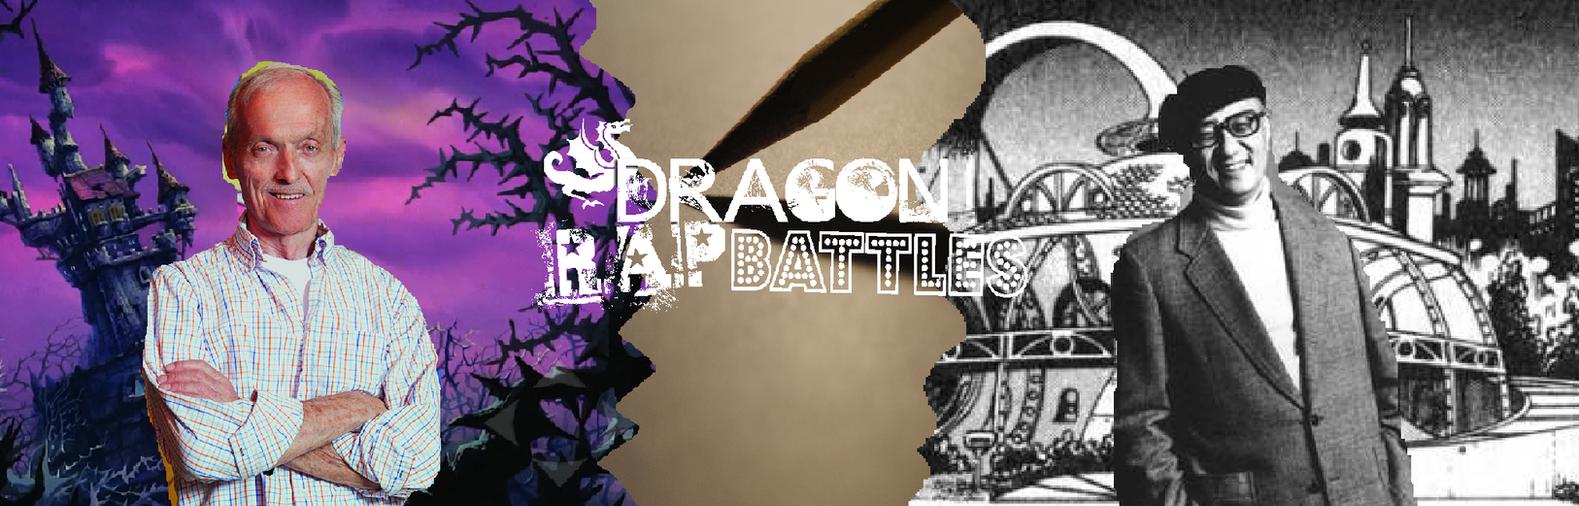 Don Bluth VS Osamu Tezuka by dragonsblood23